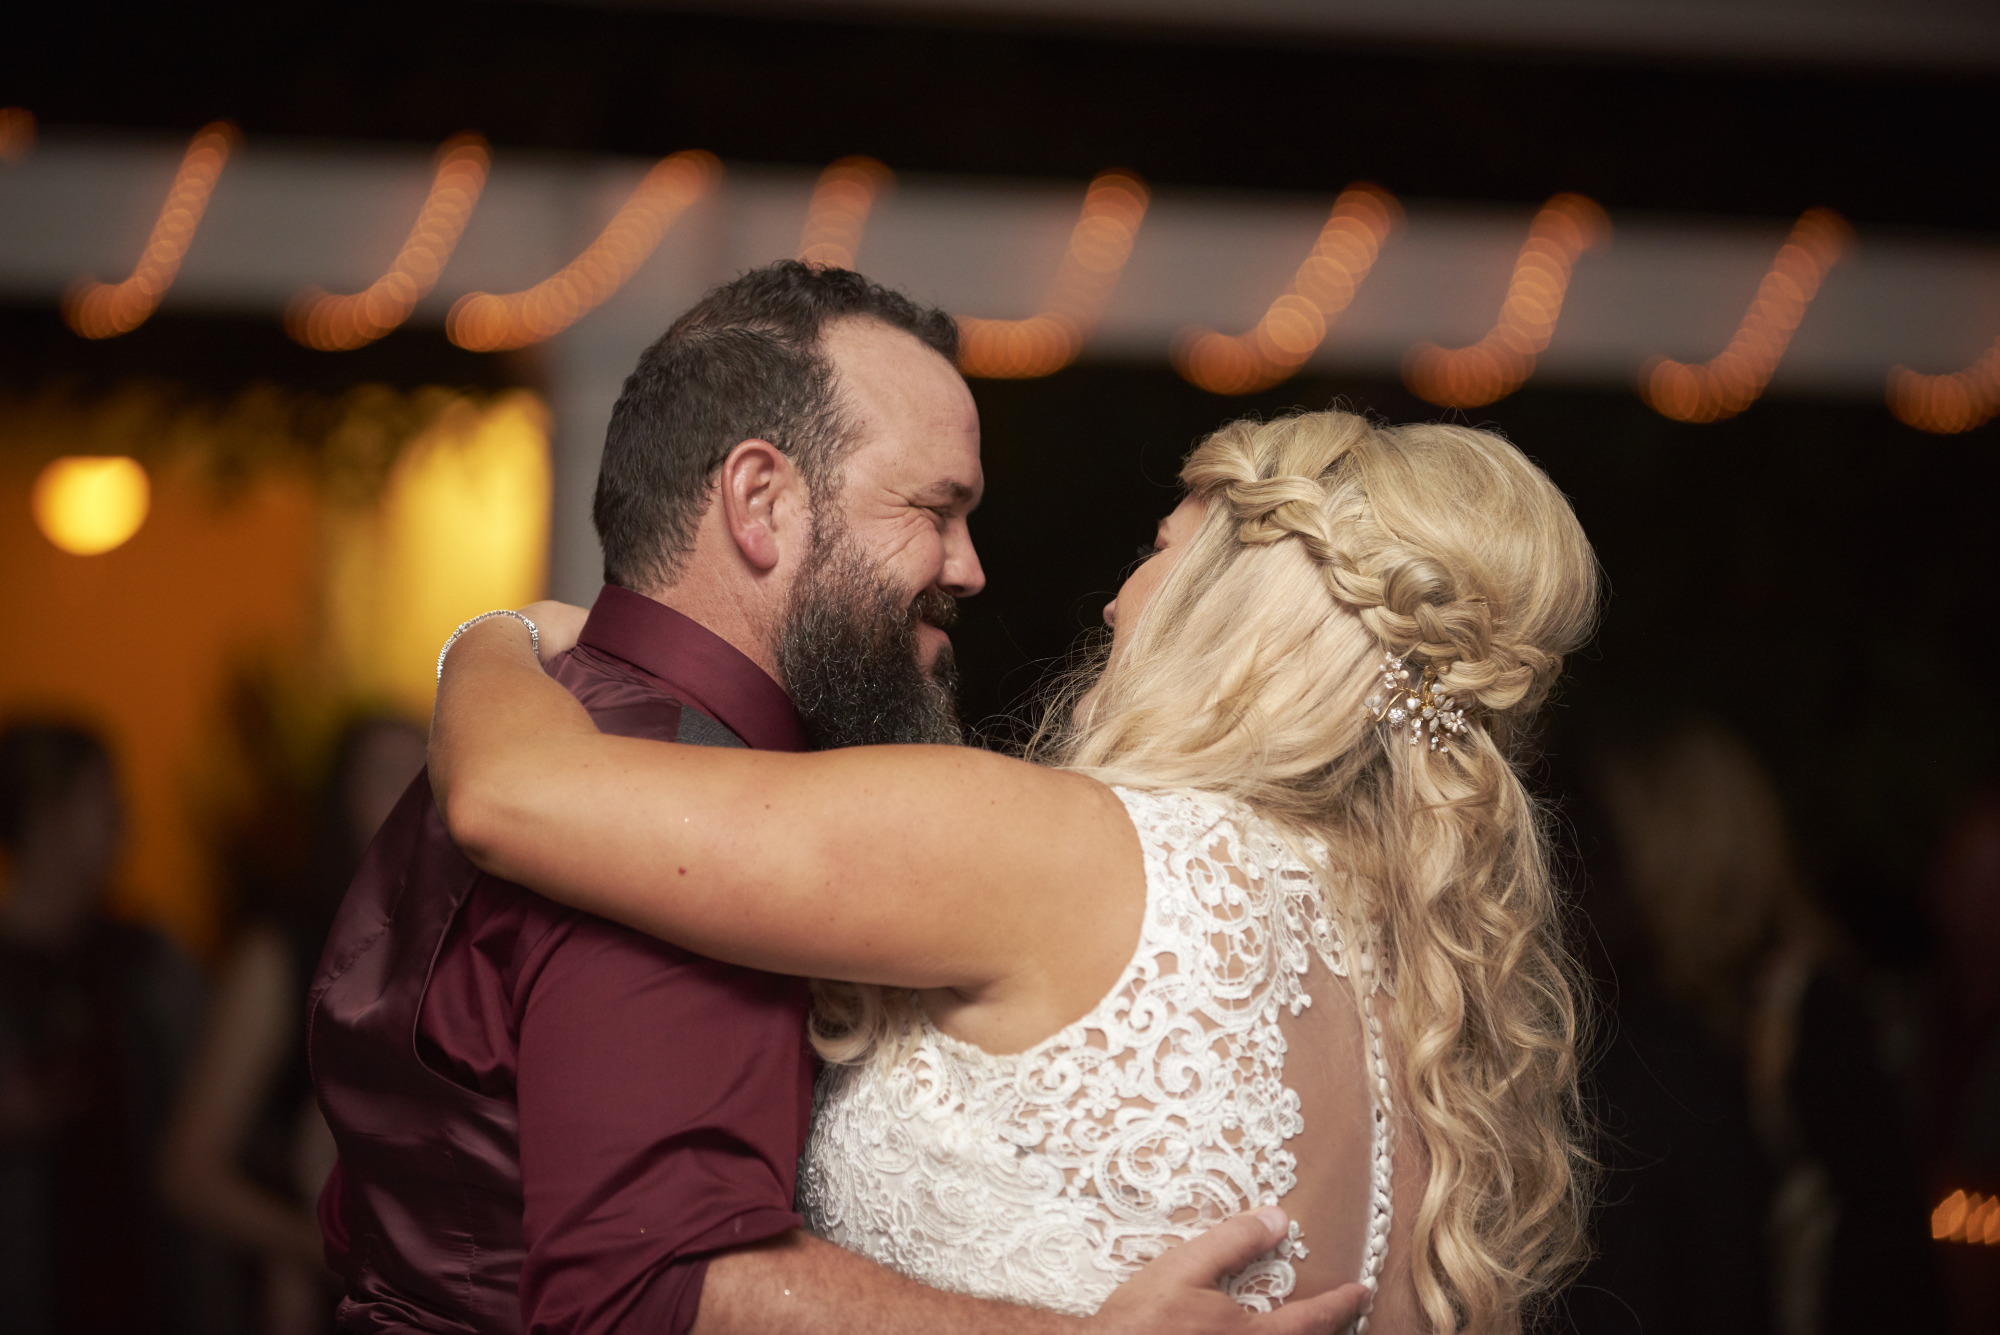 Taylor and Cody - Taylor Mansion and Crystal Ball Room - Taylor Texas - Wedding - 034